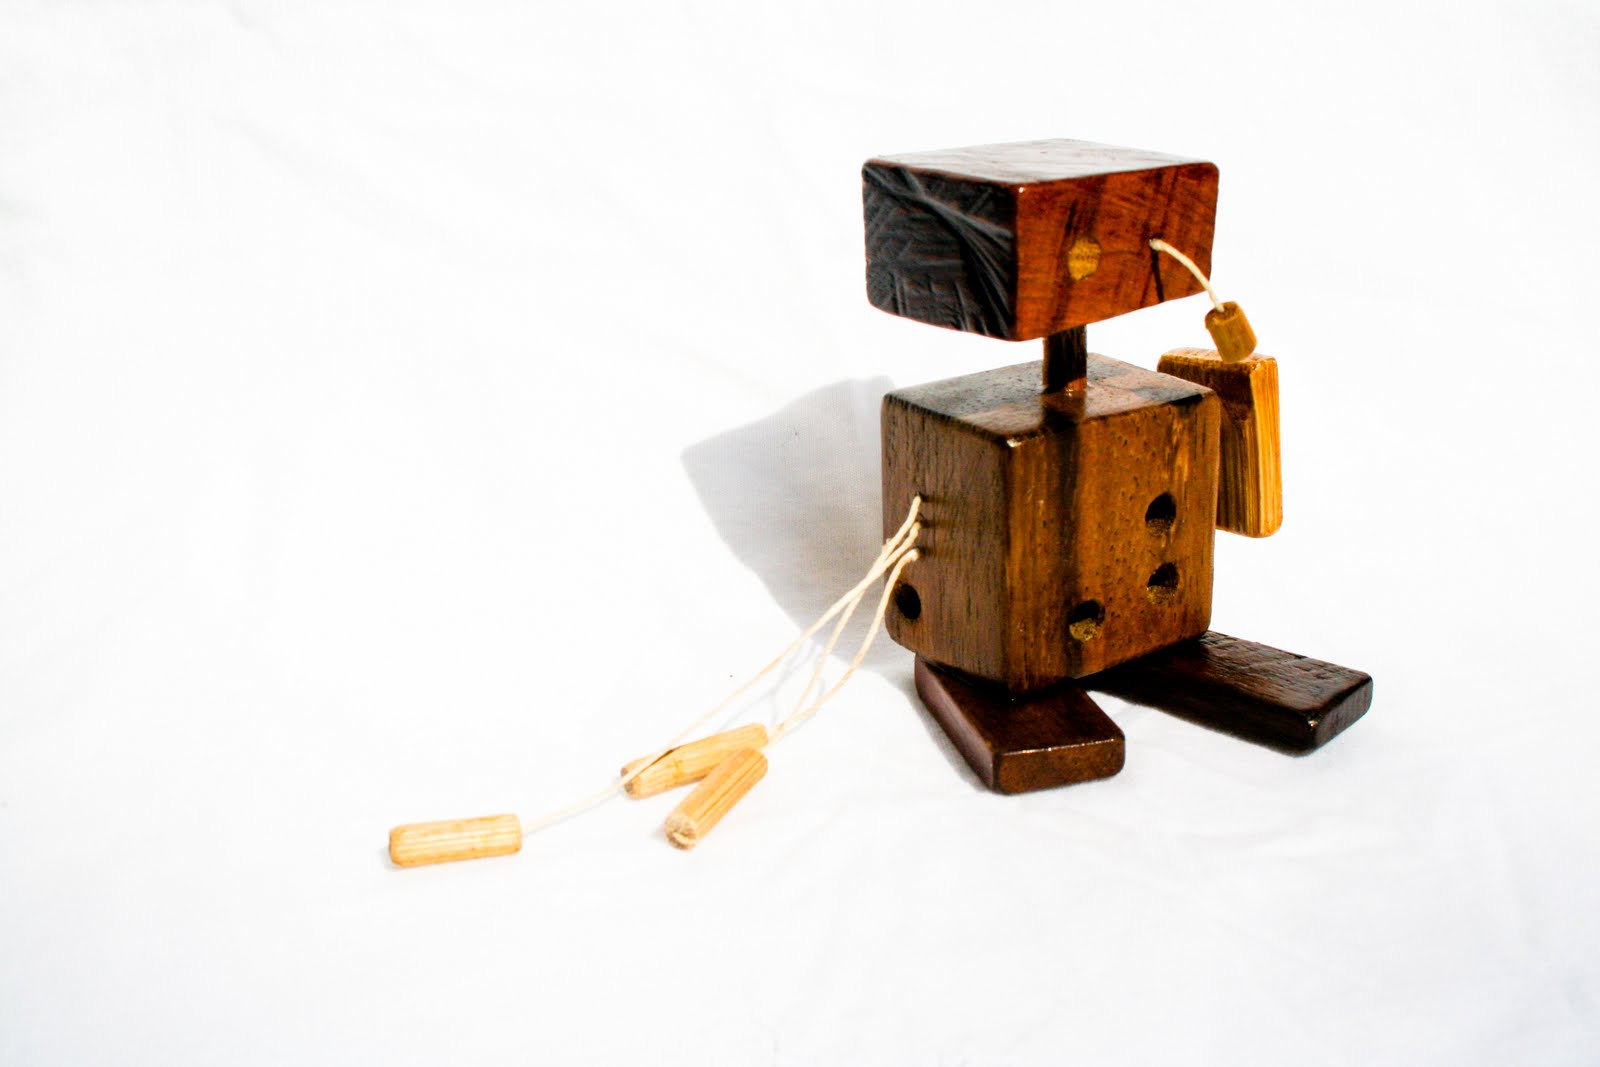 Wood robots attack M Design : robots 16 from maobamboo.blogspot.com size 1600 x 1067 jpeg 71kB